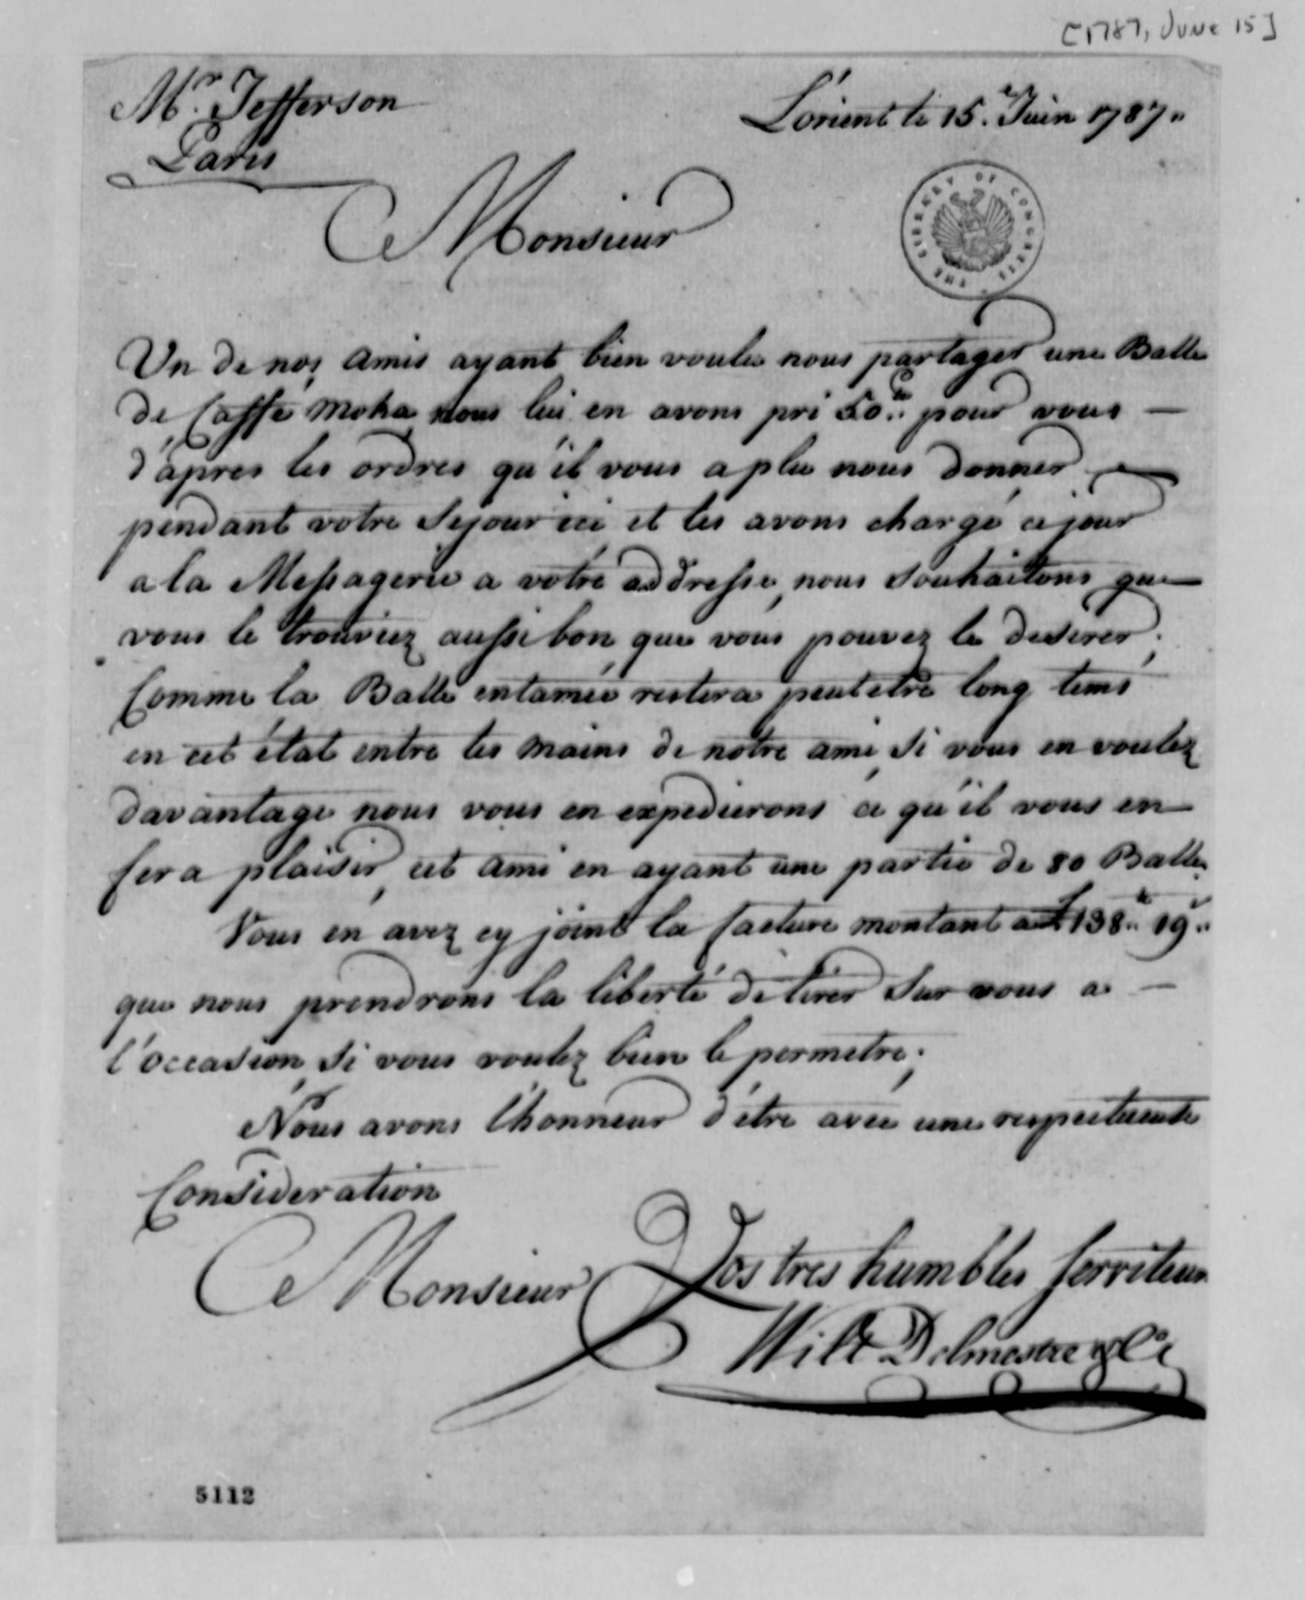 Wilt, Delmestre & Company to Thomas Jefferson, June 15, 1787, with Invoice for Shipment of Mocha Coffee